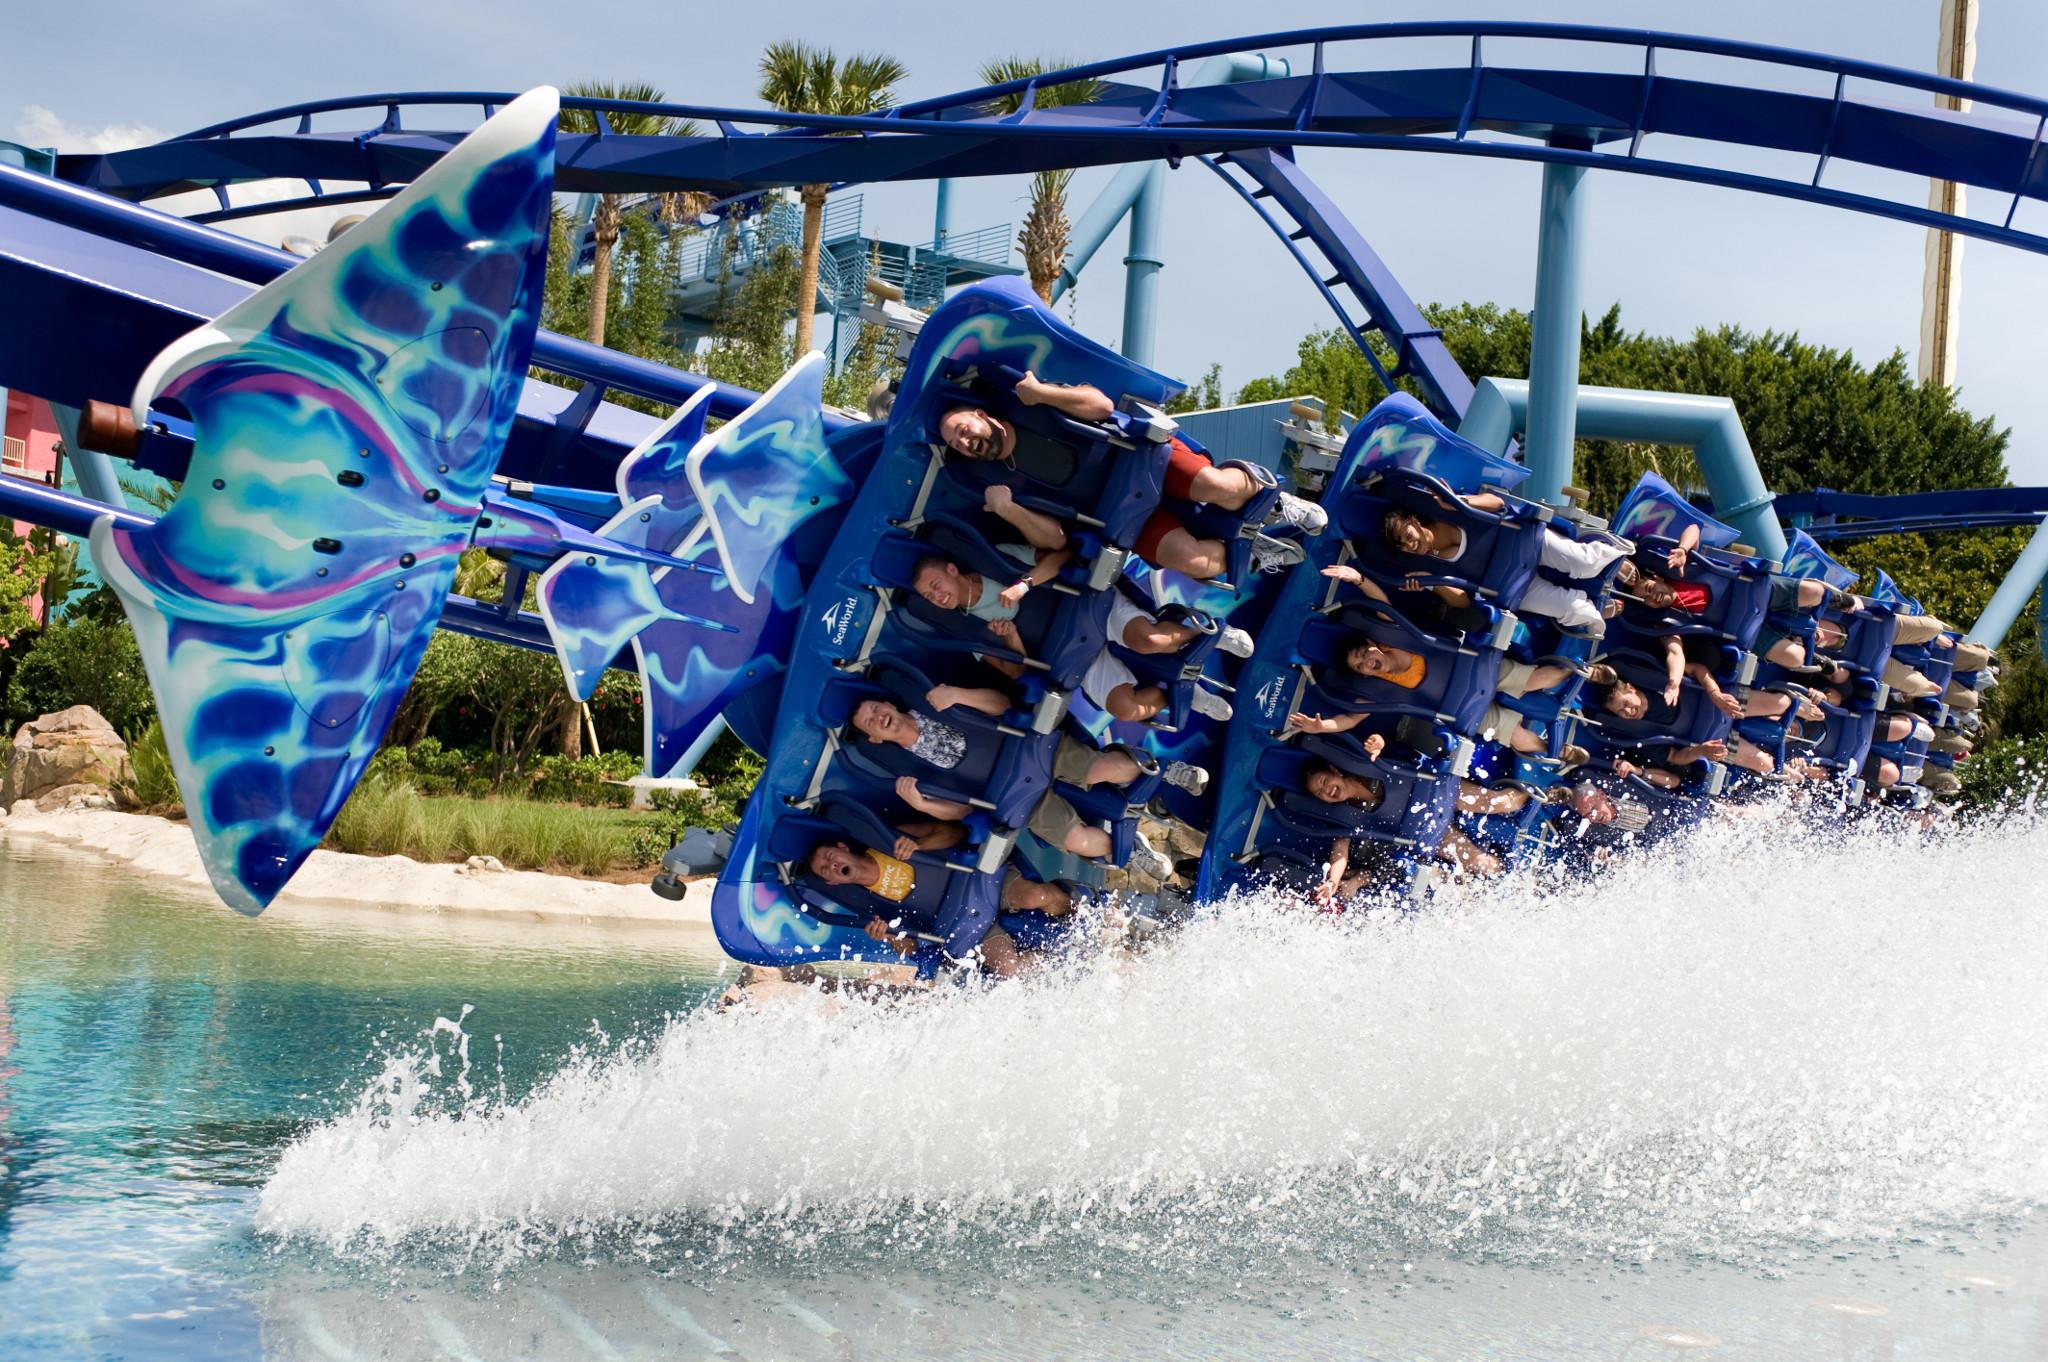 Manta roller coaster at SeaWorld Orlando splashing along the water.